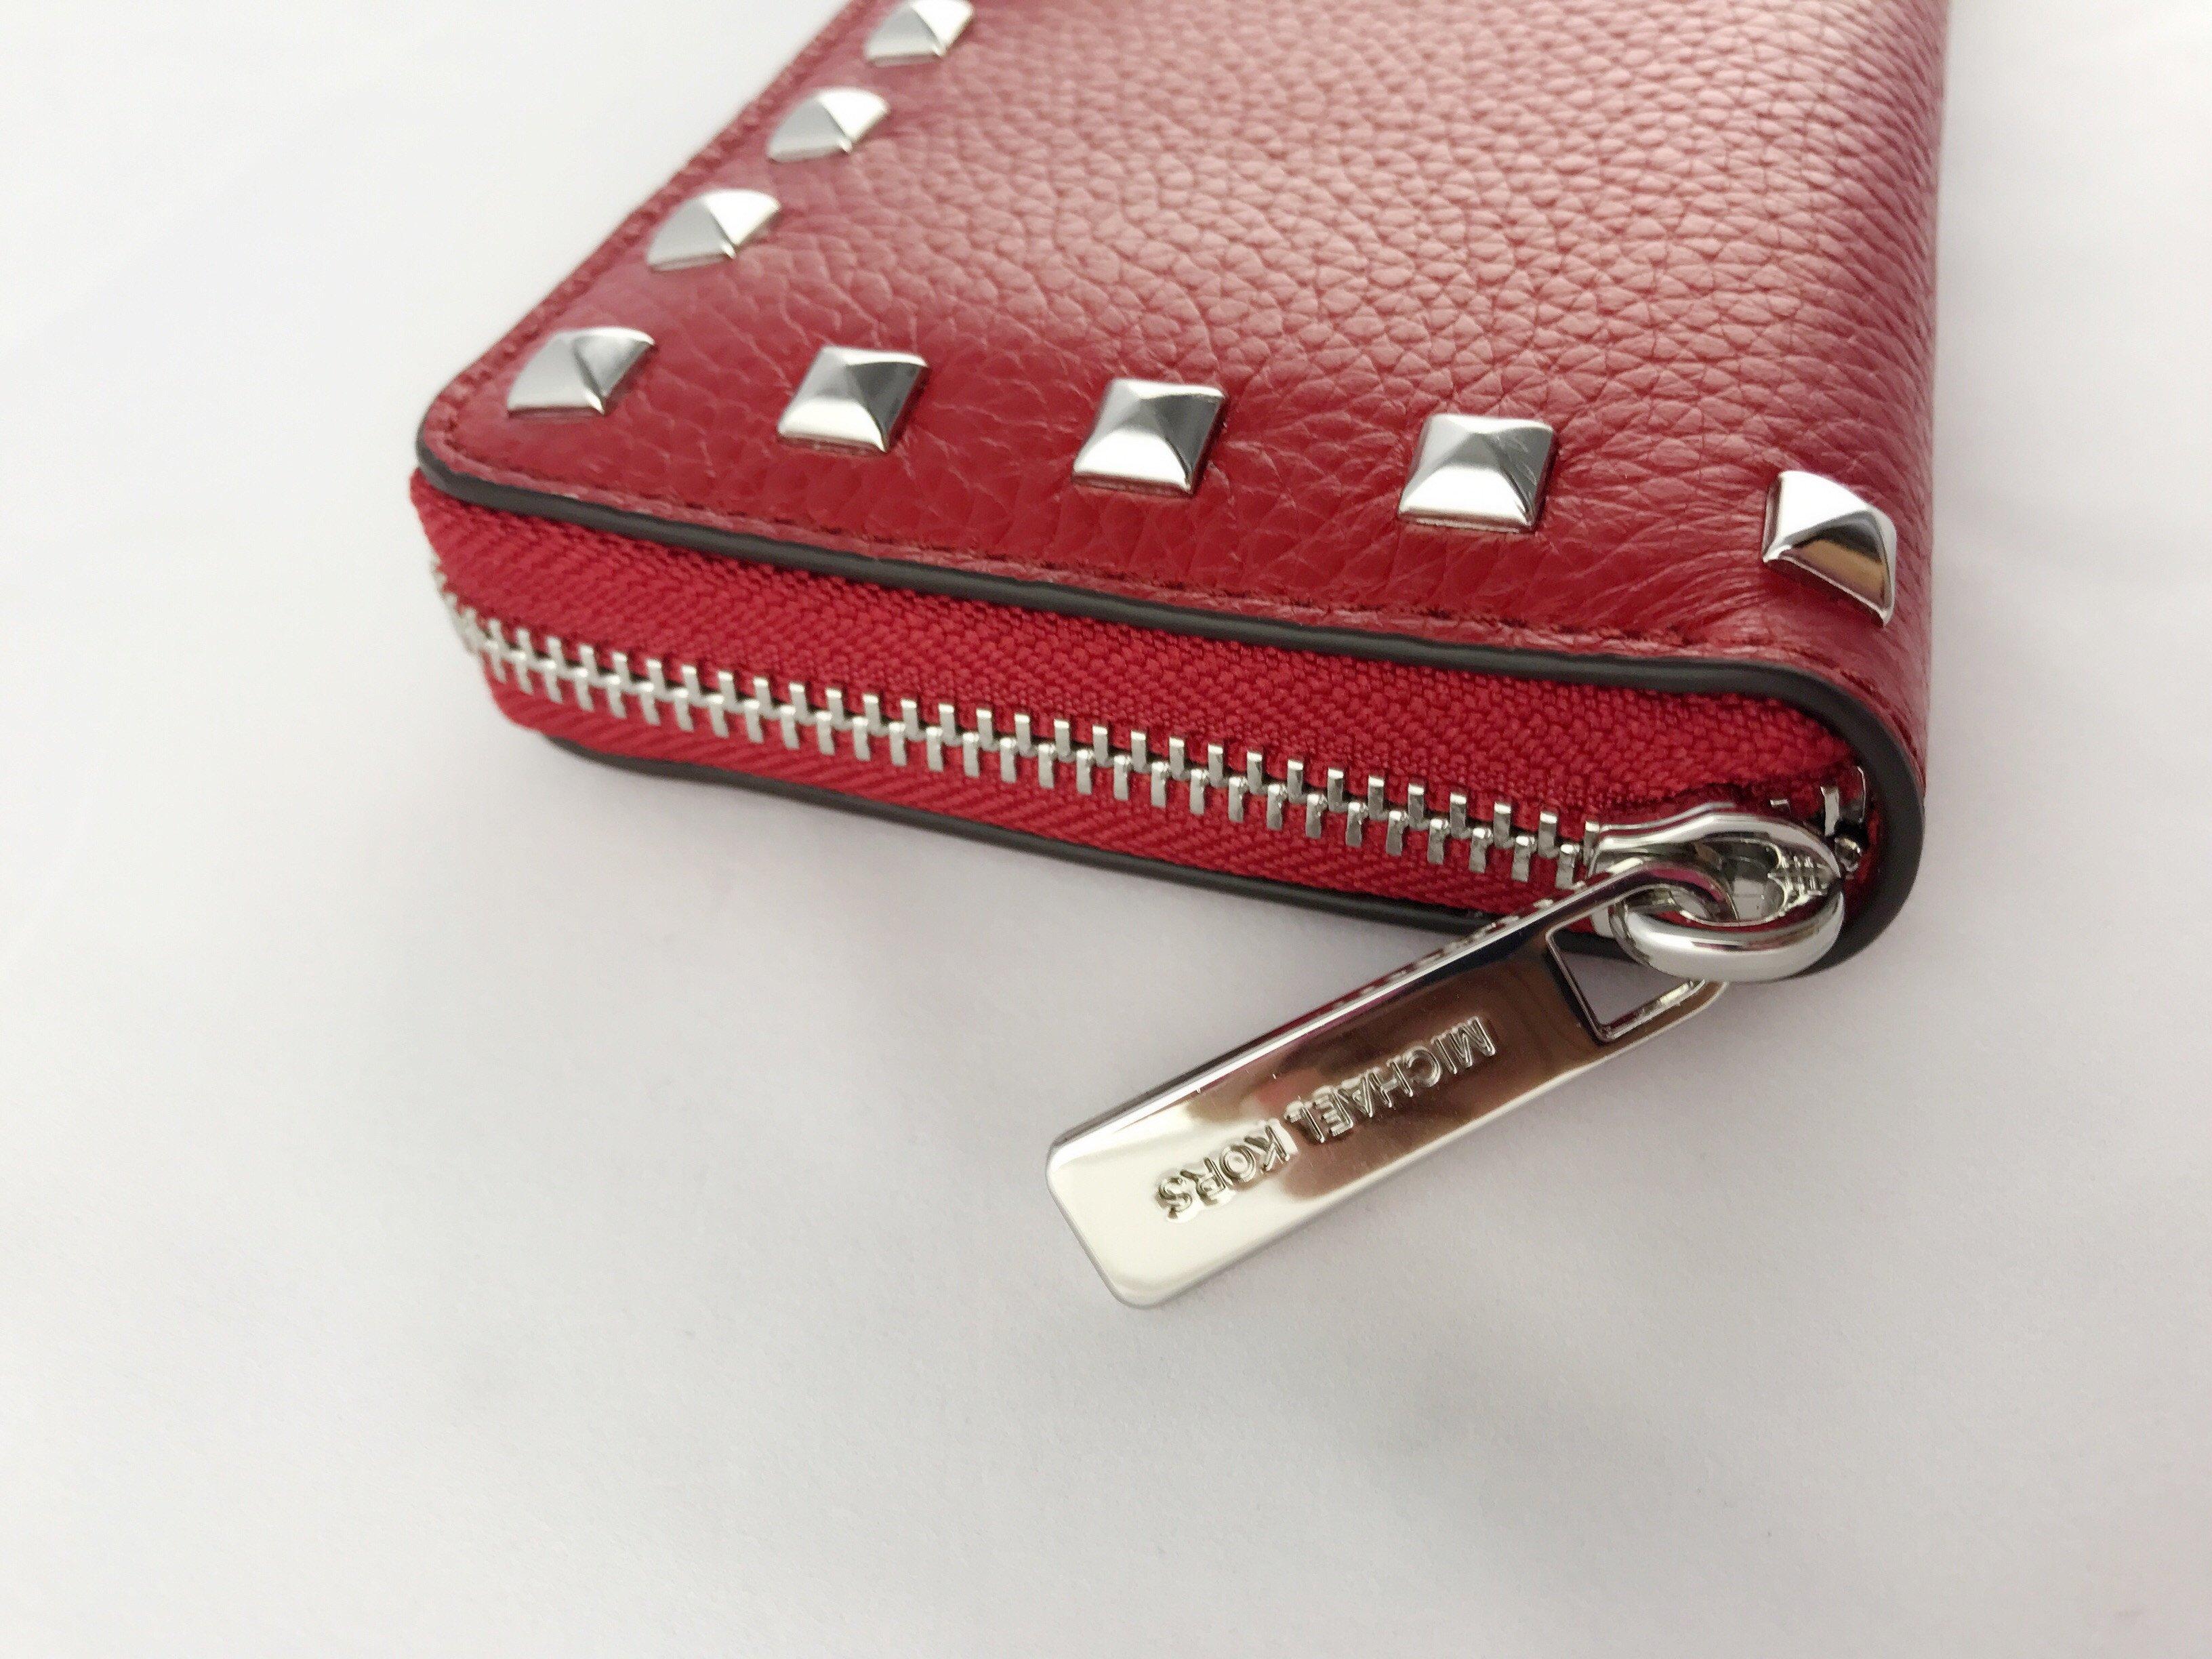 80785dd5407a Michael Kors Jet Set Continental Zip Around Wallet Studded Red Blue ...